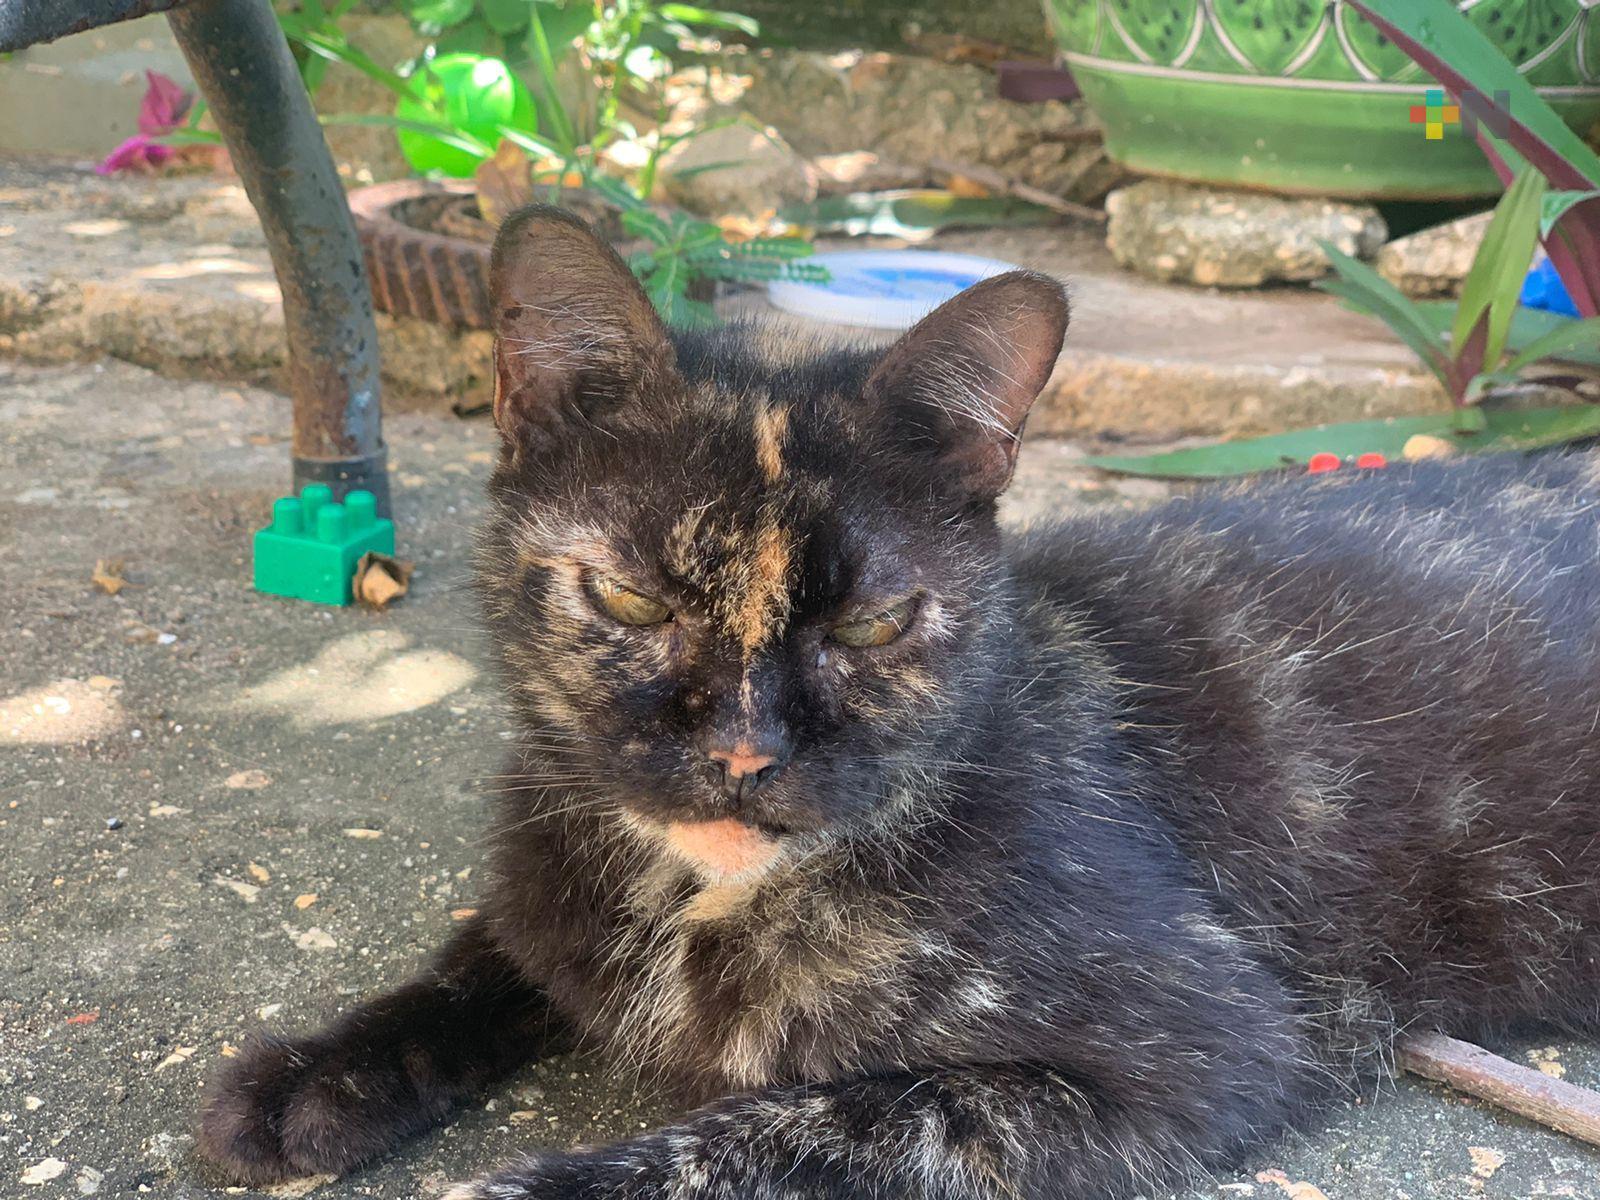 Inicia temporada de no dar gatos en adopción; son ocupados en rituales: Isis Guillén